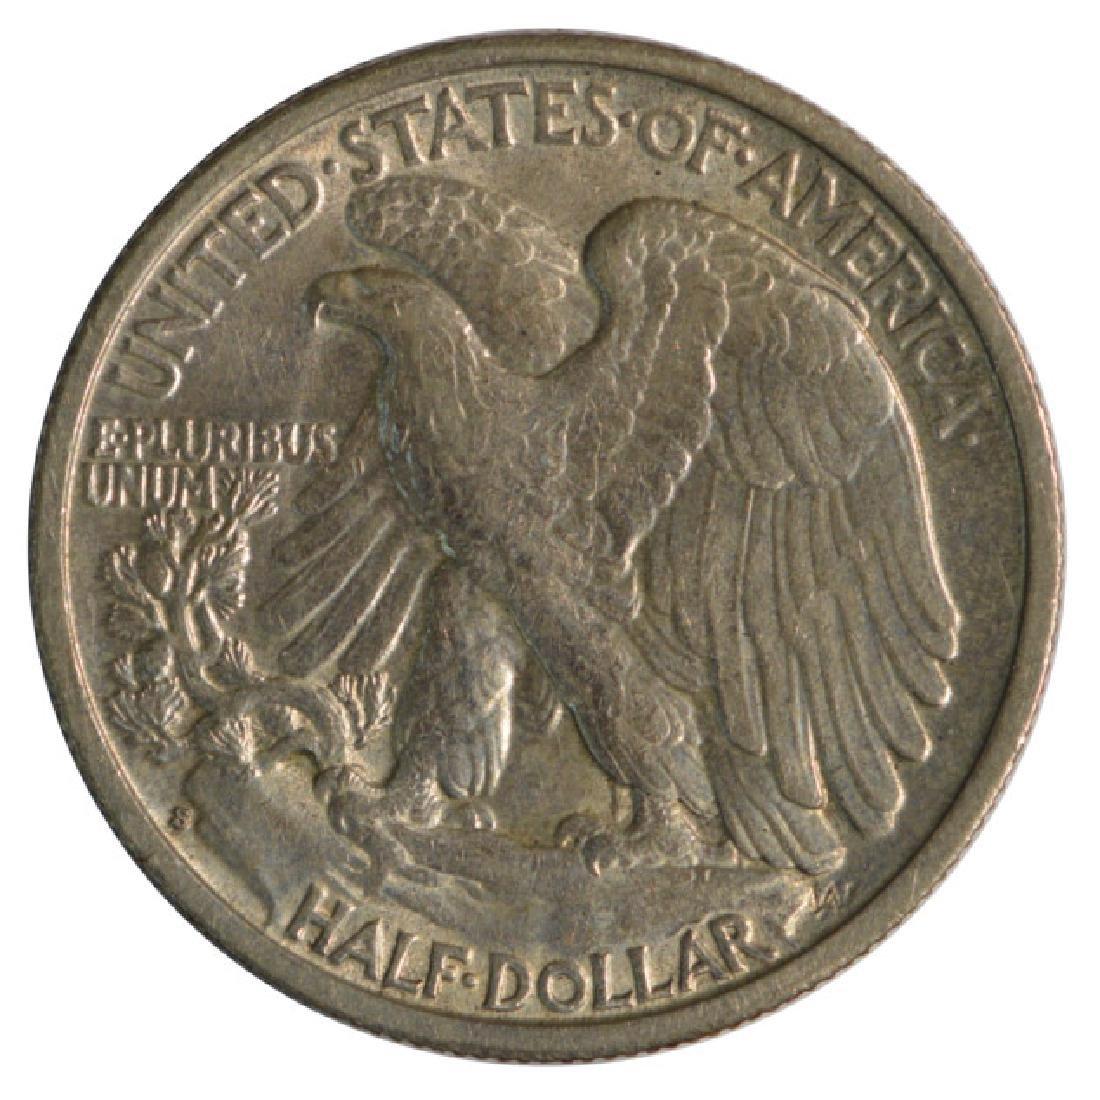 1937-S Walking Liberty Half Dollar Coin - 2